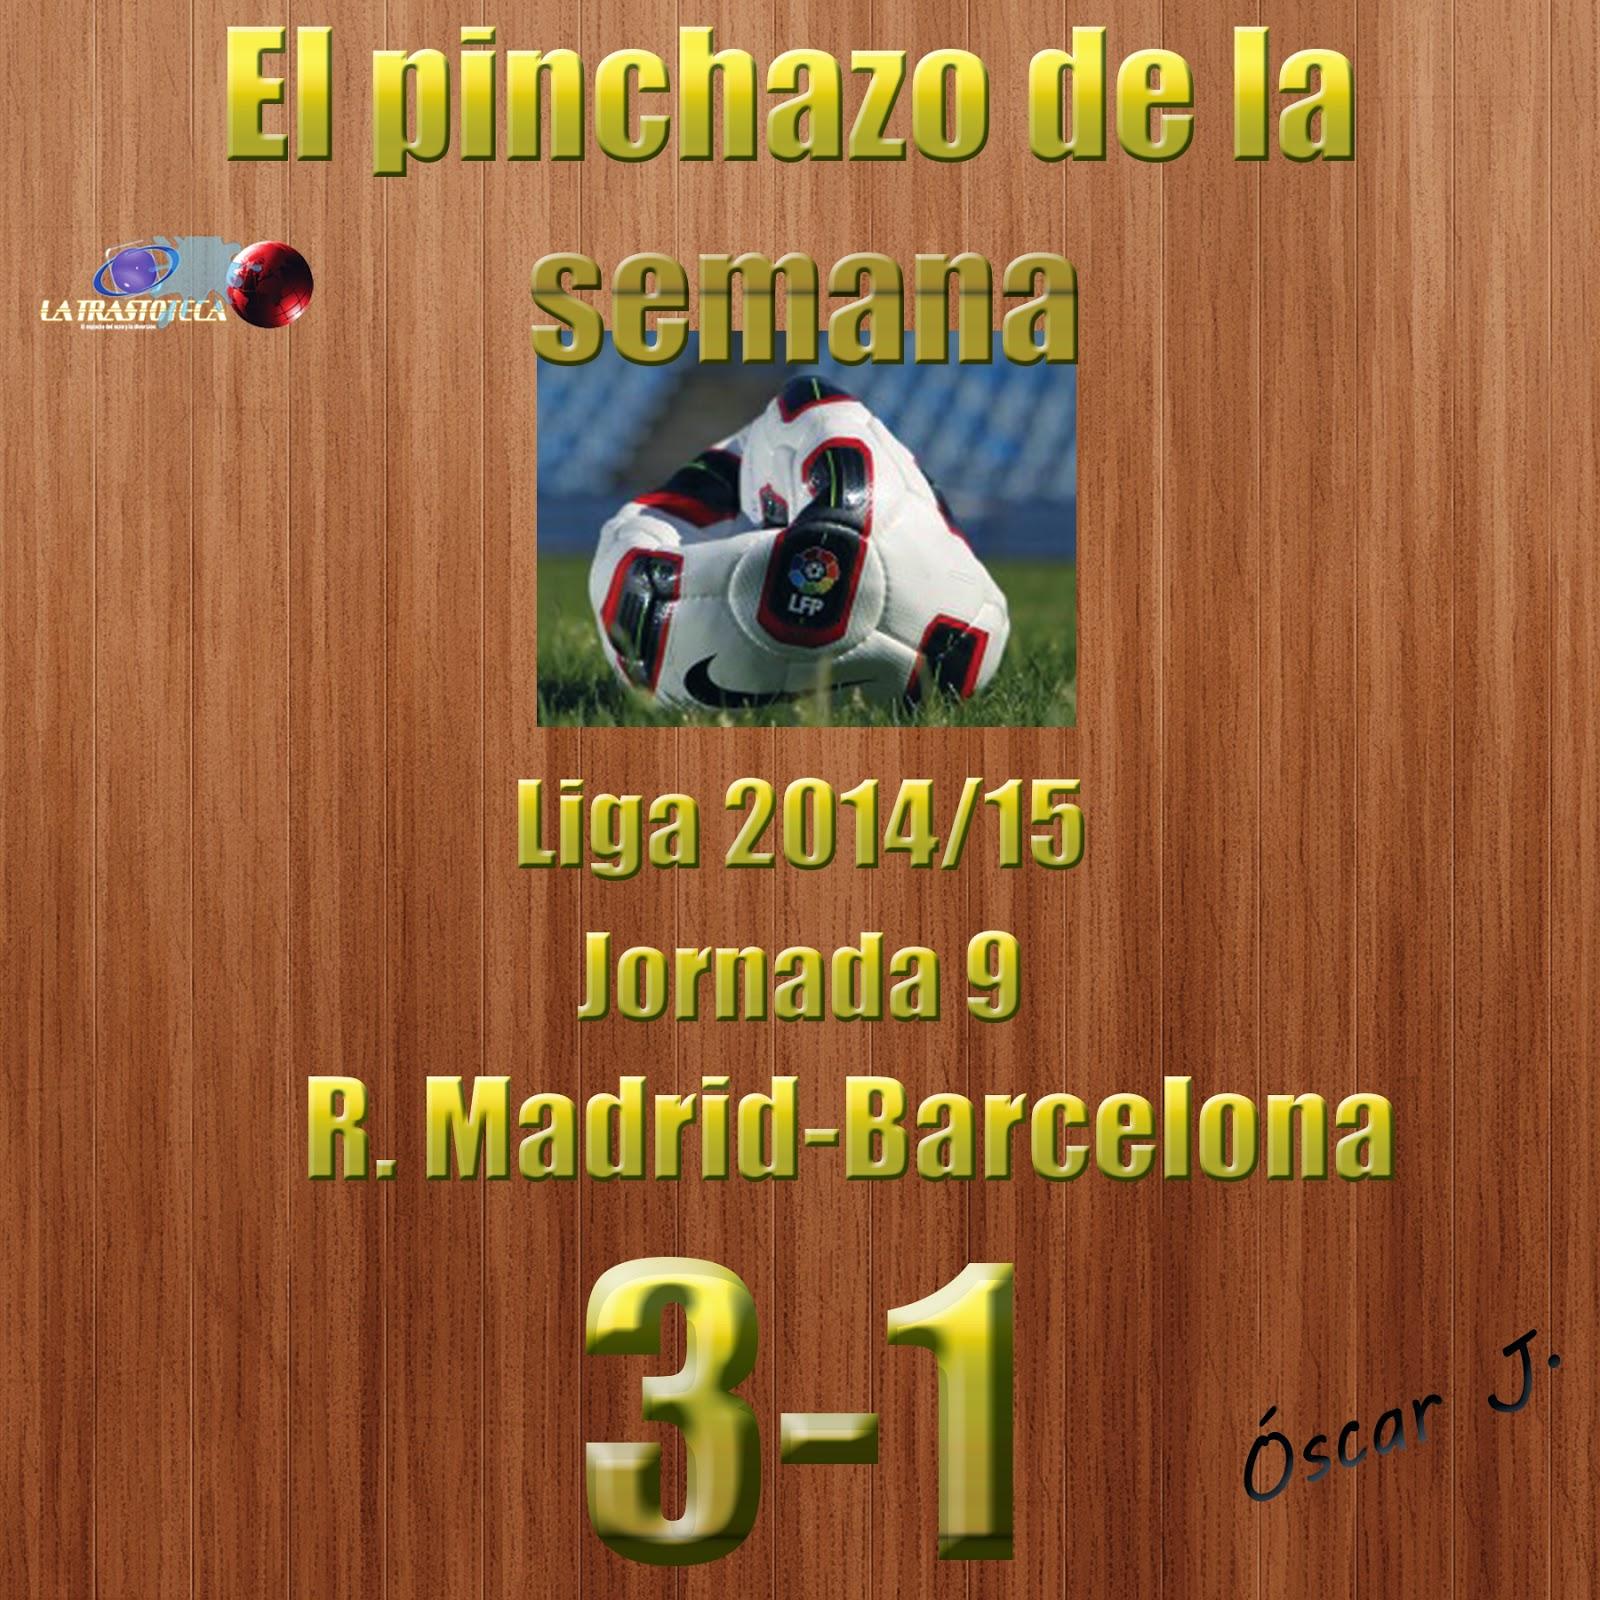 Real Madrid 3-1 Barcelona. Liga 2014/15 - Jornada 9. El pinchazo de la semana.